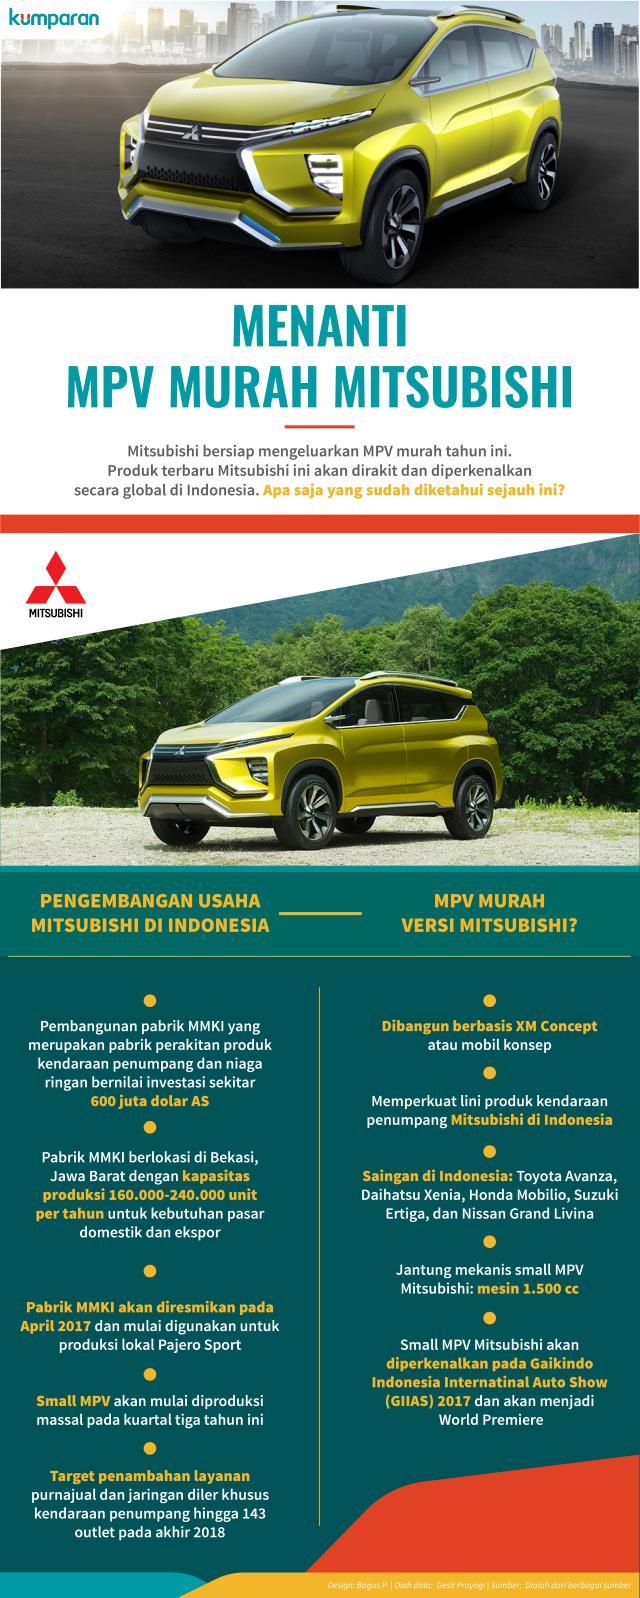 Fakta Seputar Mitsubishi Xpander, Lawan Avanza Cs yang Debut Agustus (89814)